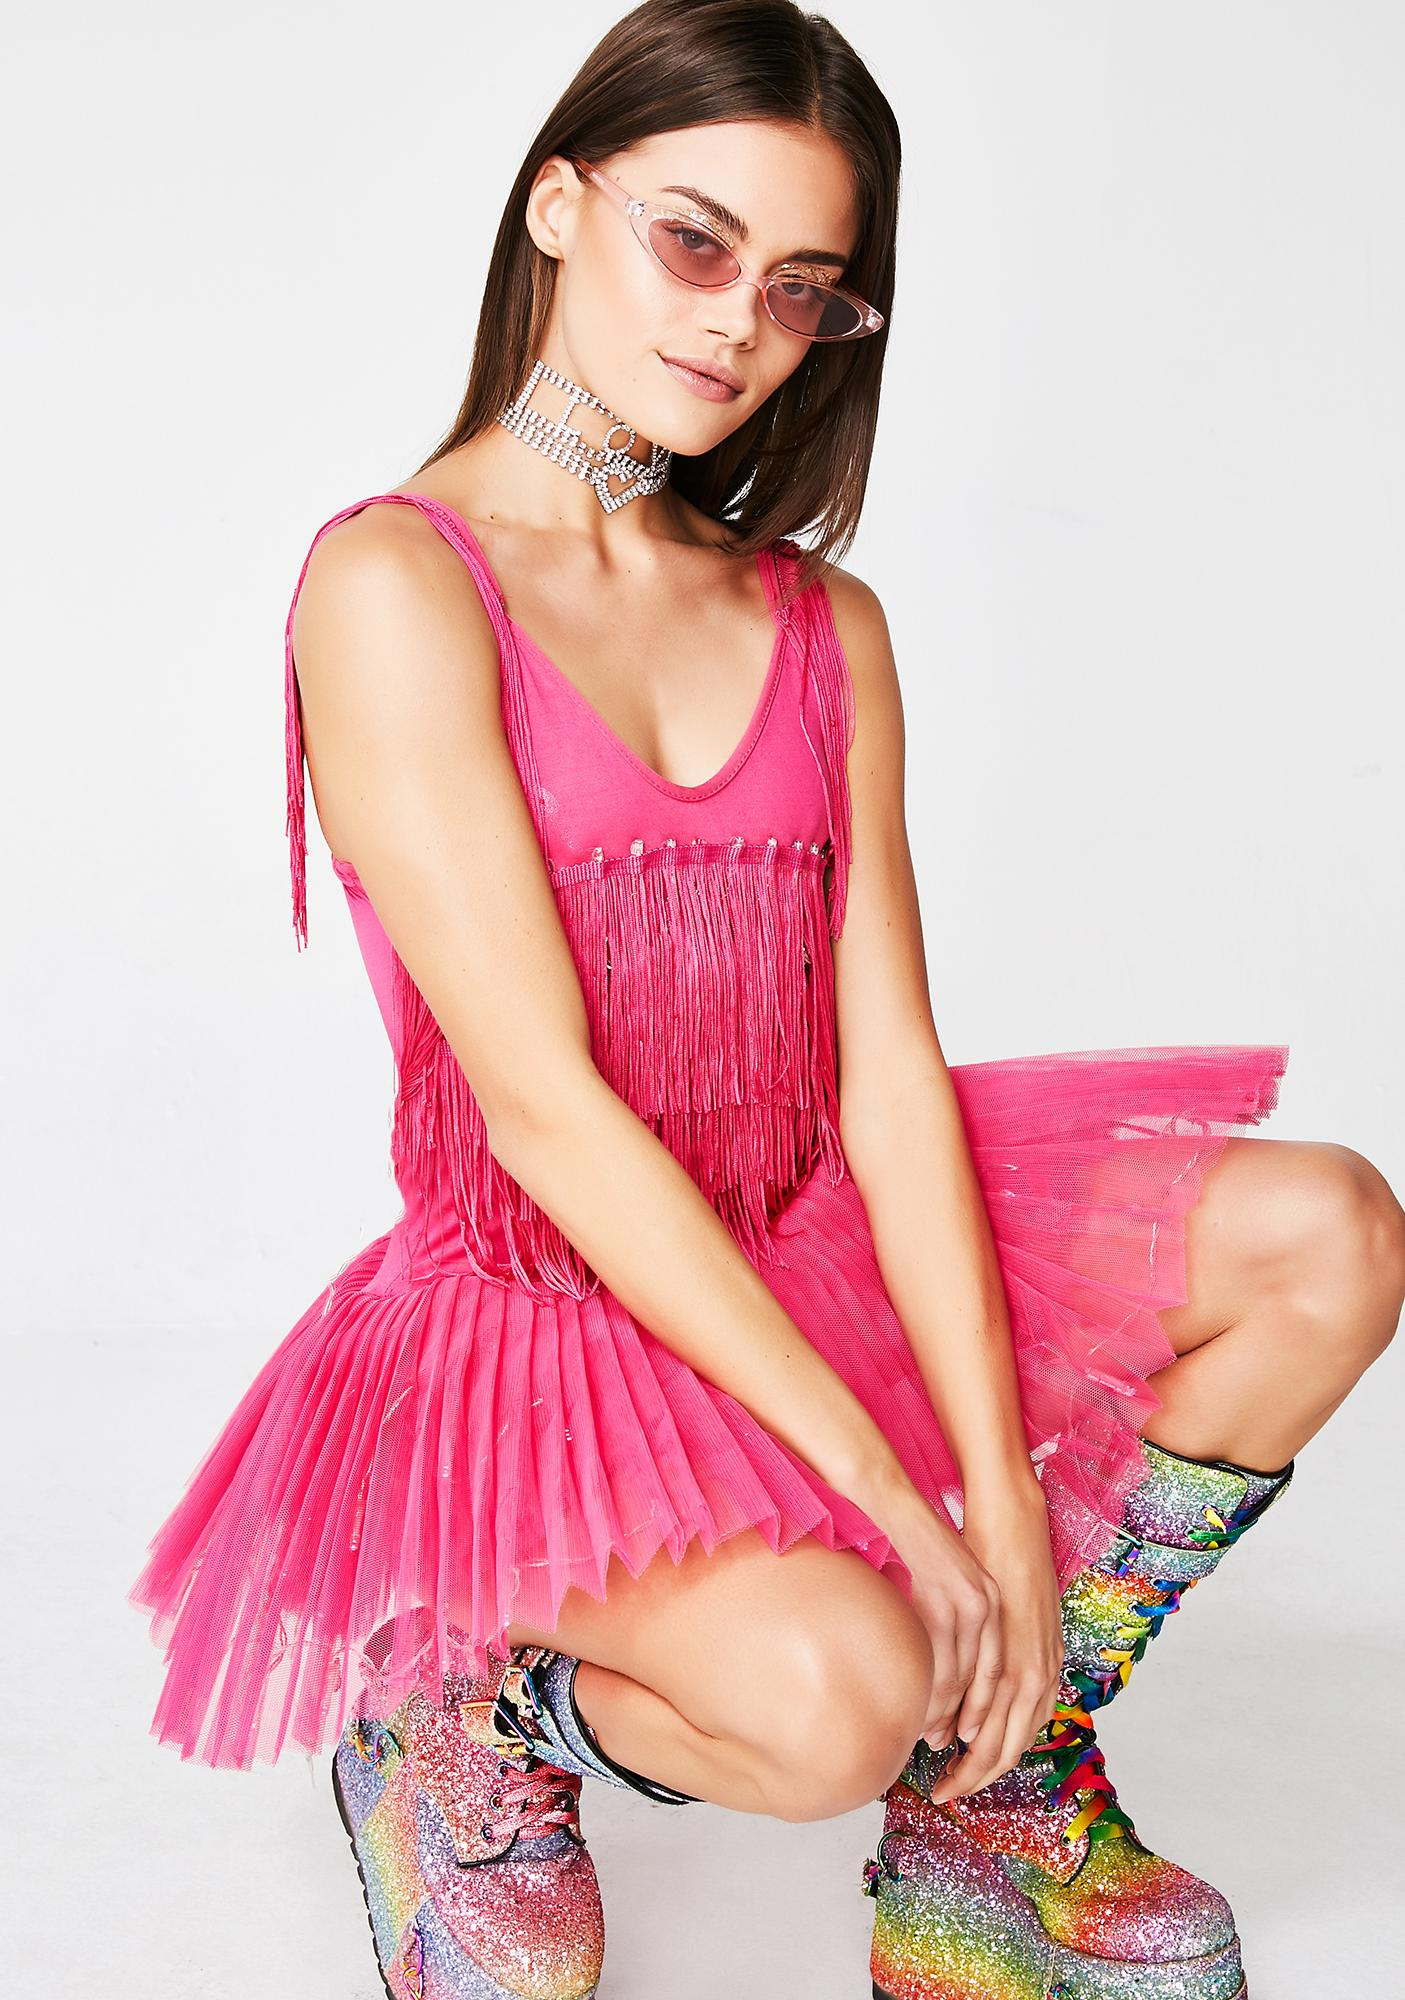 Neon Cowboys Acid Ballerina Light Up Dress